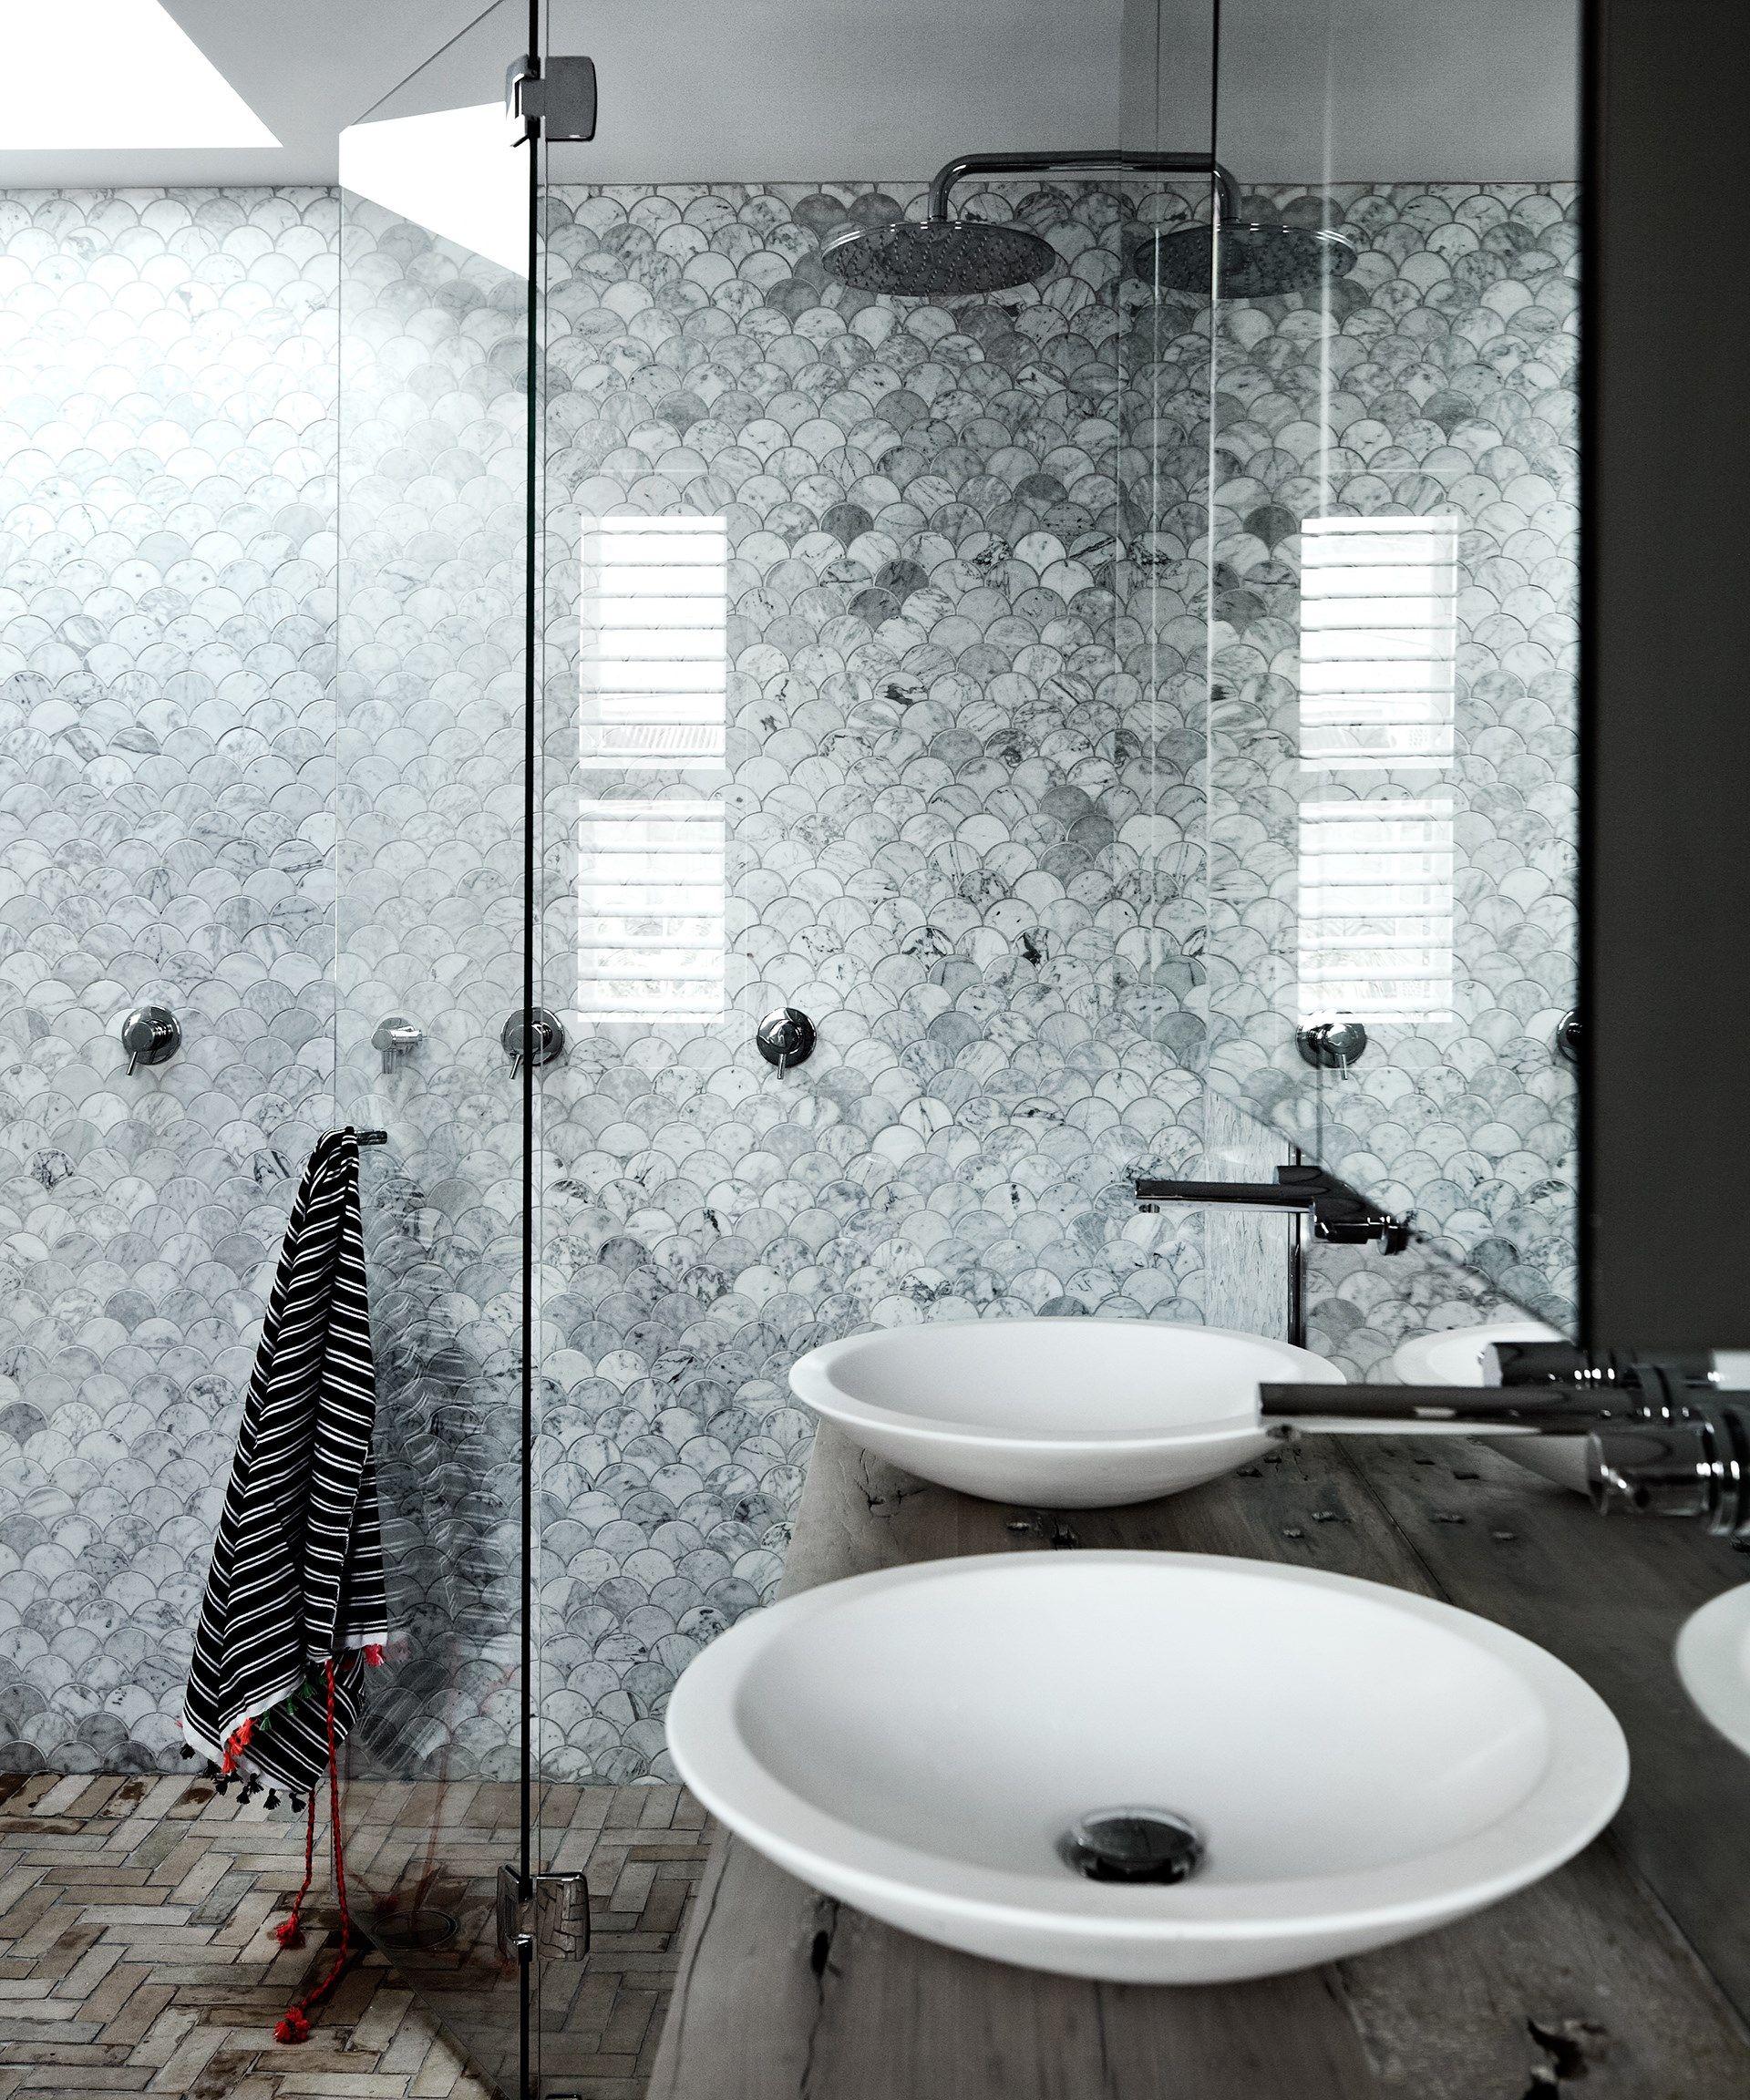 20 Beautiful Bathrooms To Inspire   Bathrooms   Pinterest   80s ...